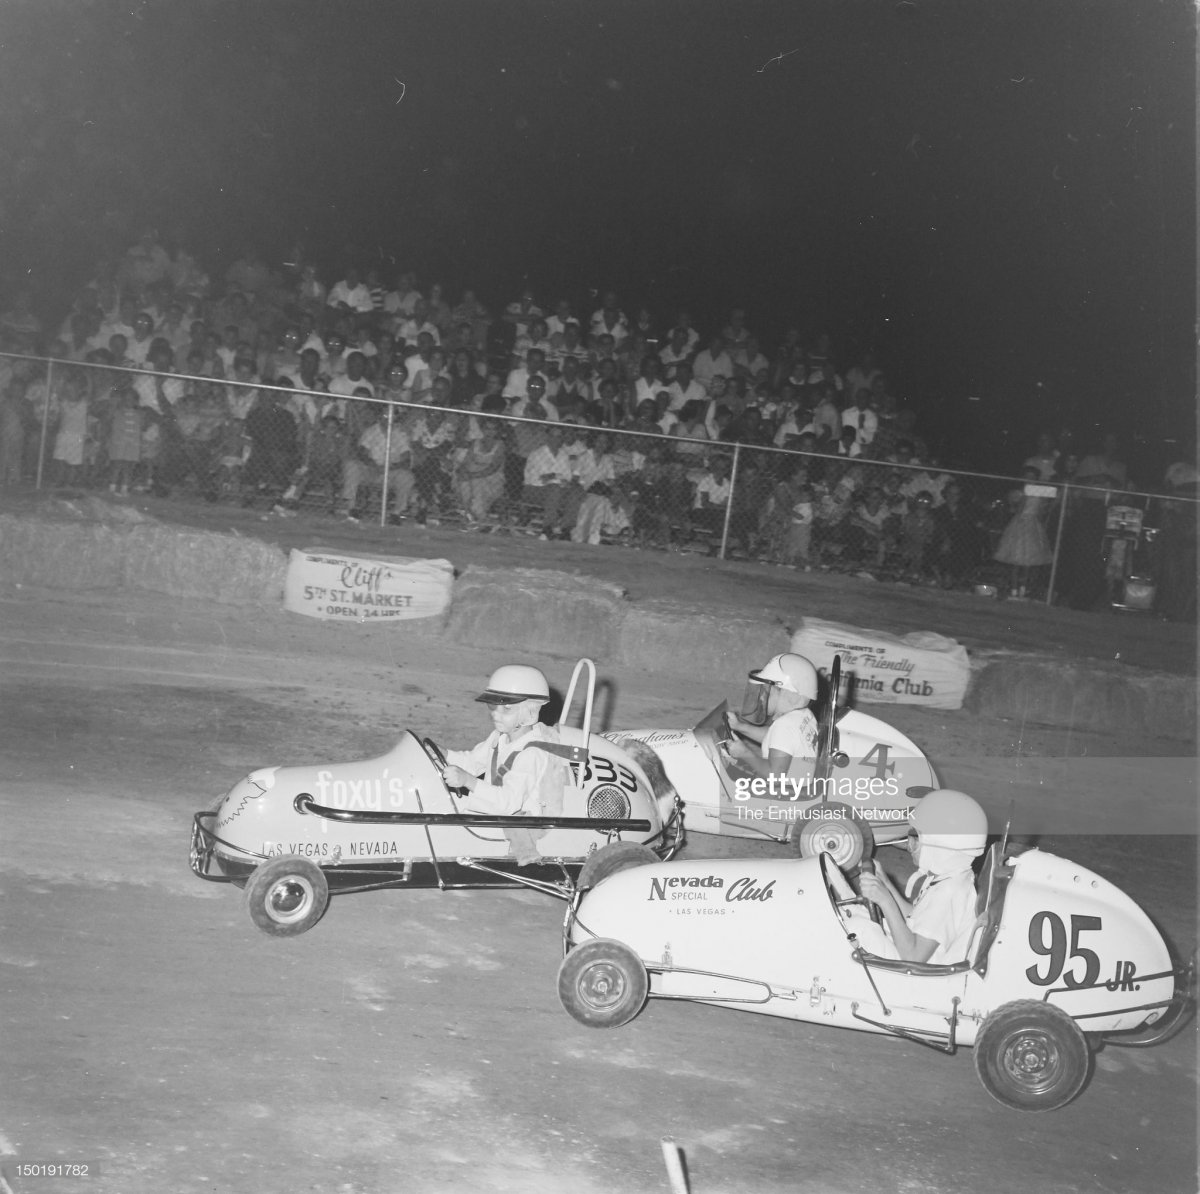 60 1956  Quarter Midgets at Las Vegas. 2.jpg